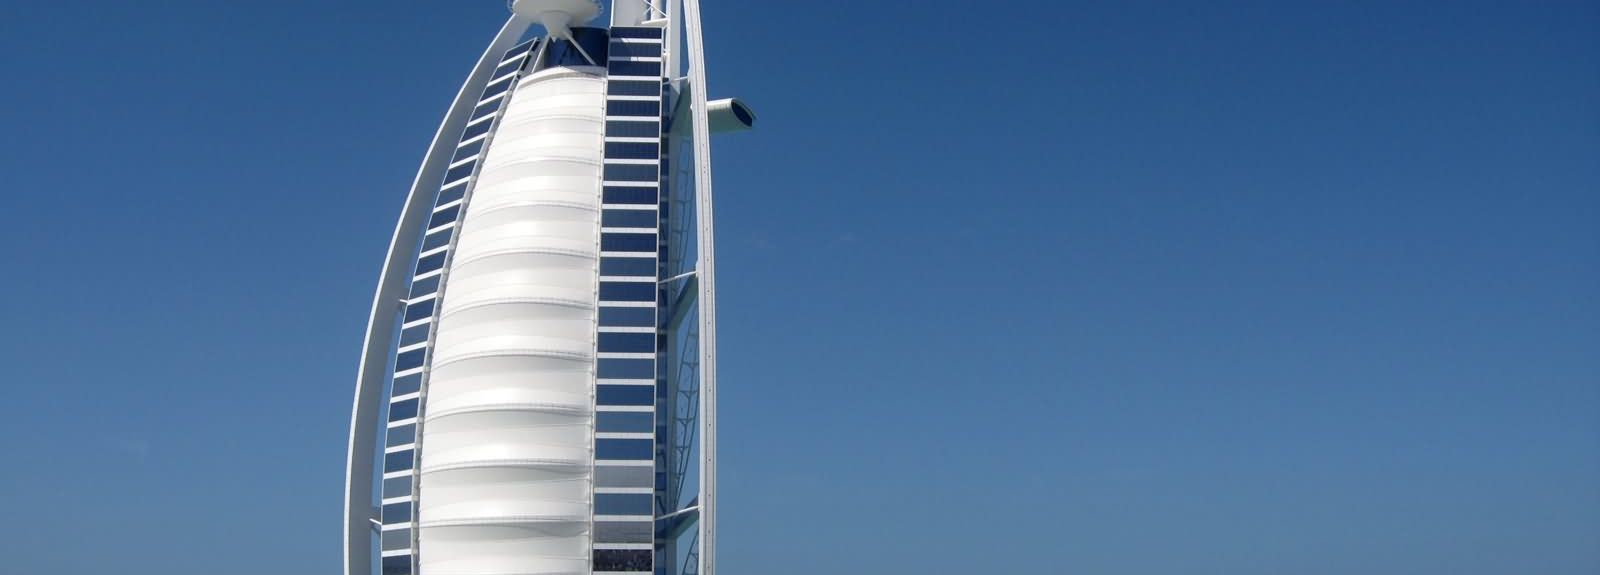 Al Barsha 1 - Dubai - United Arab Emirates